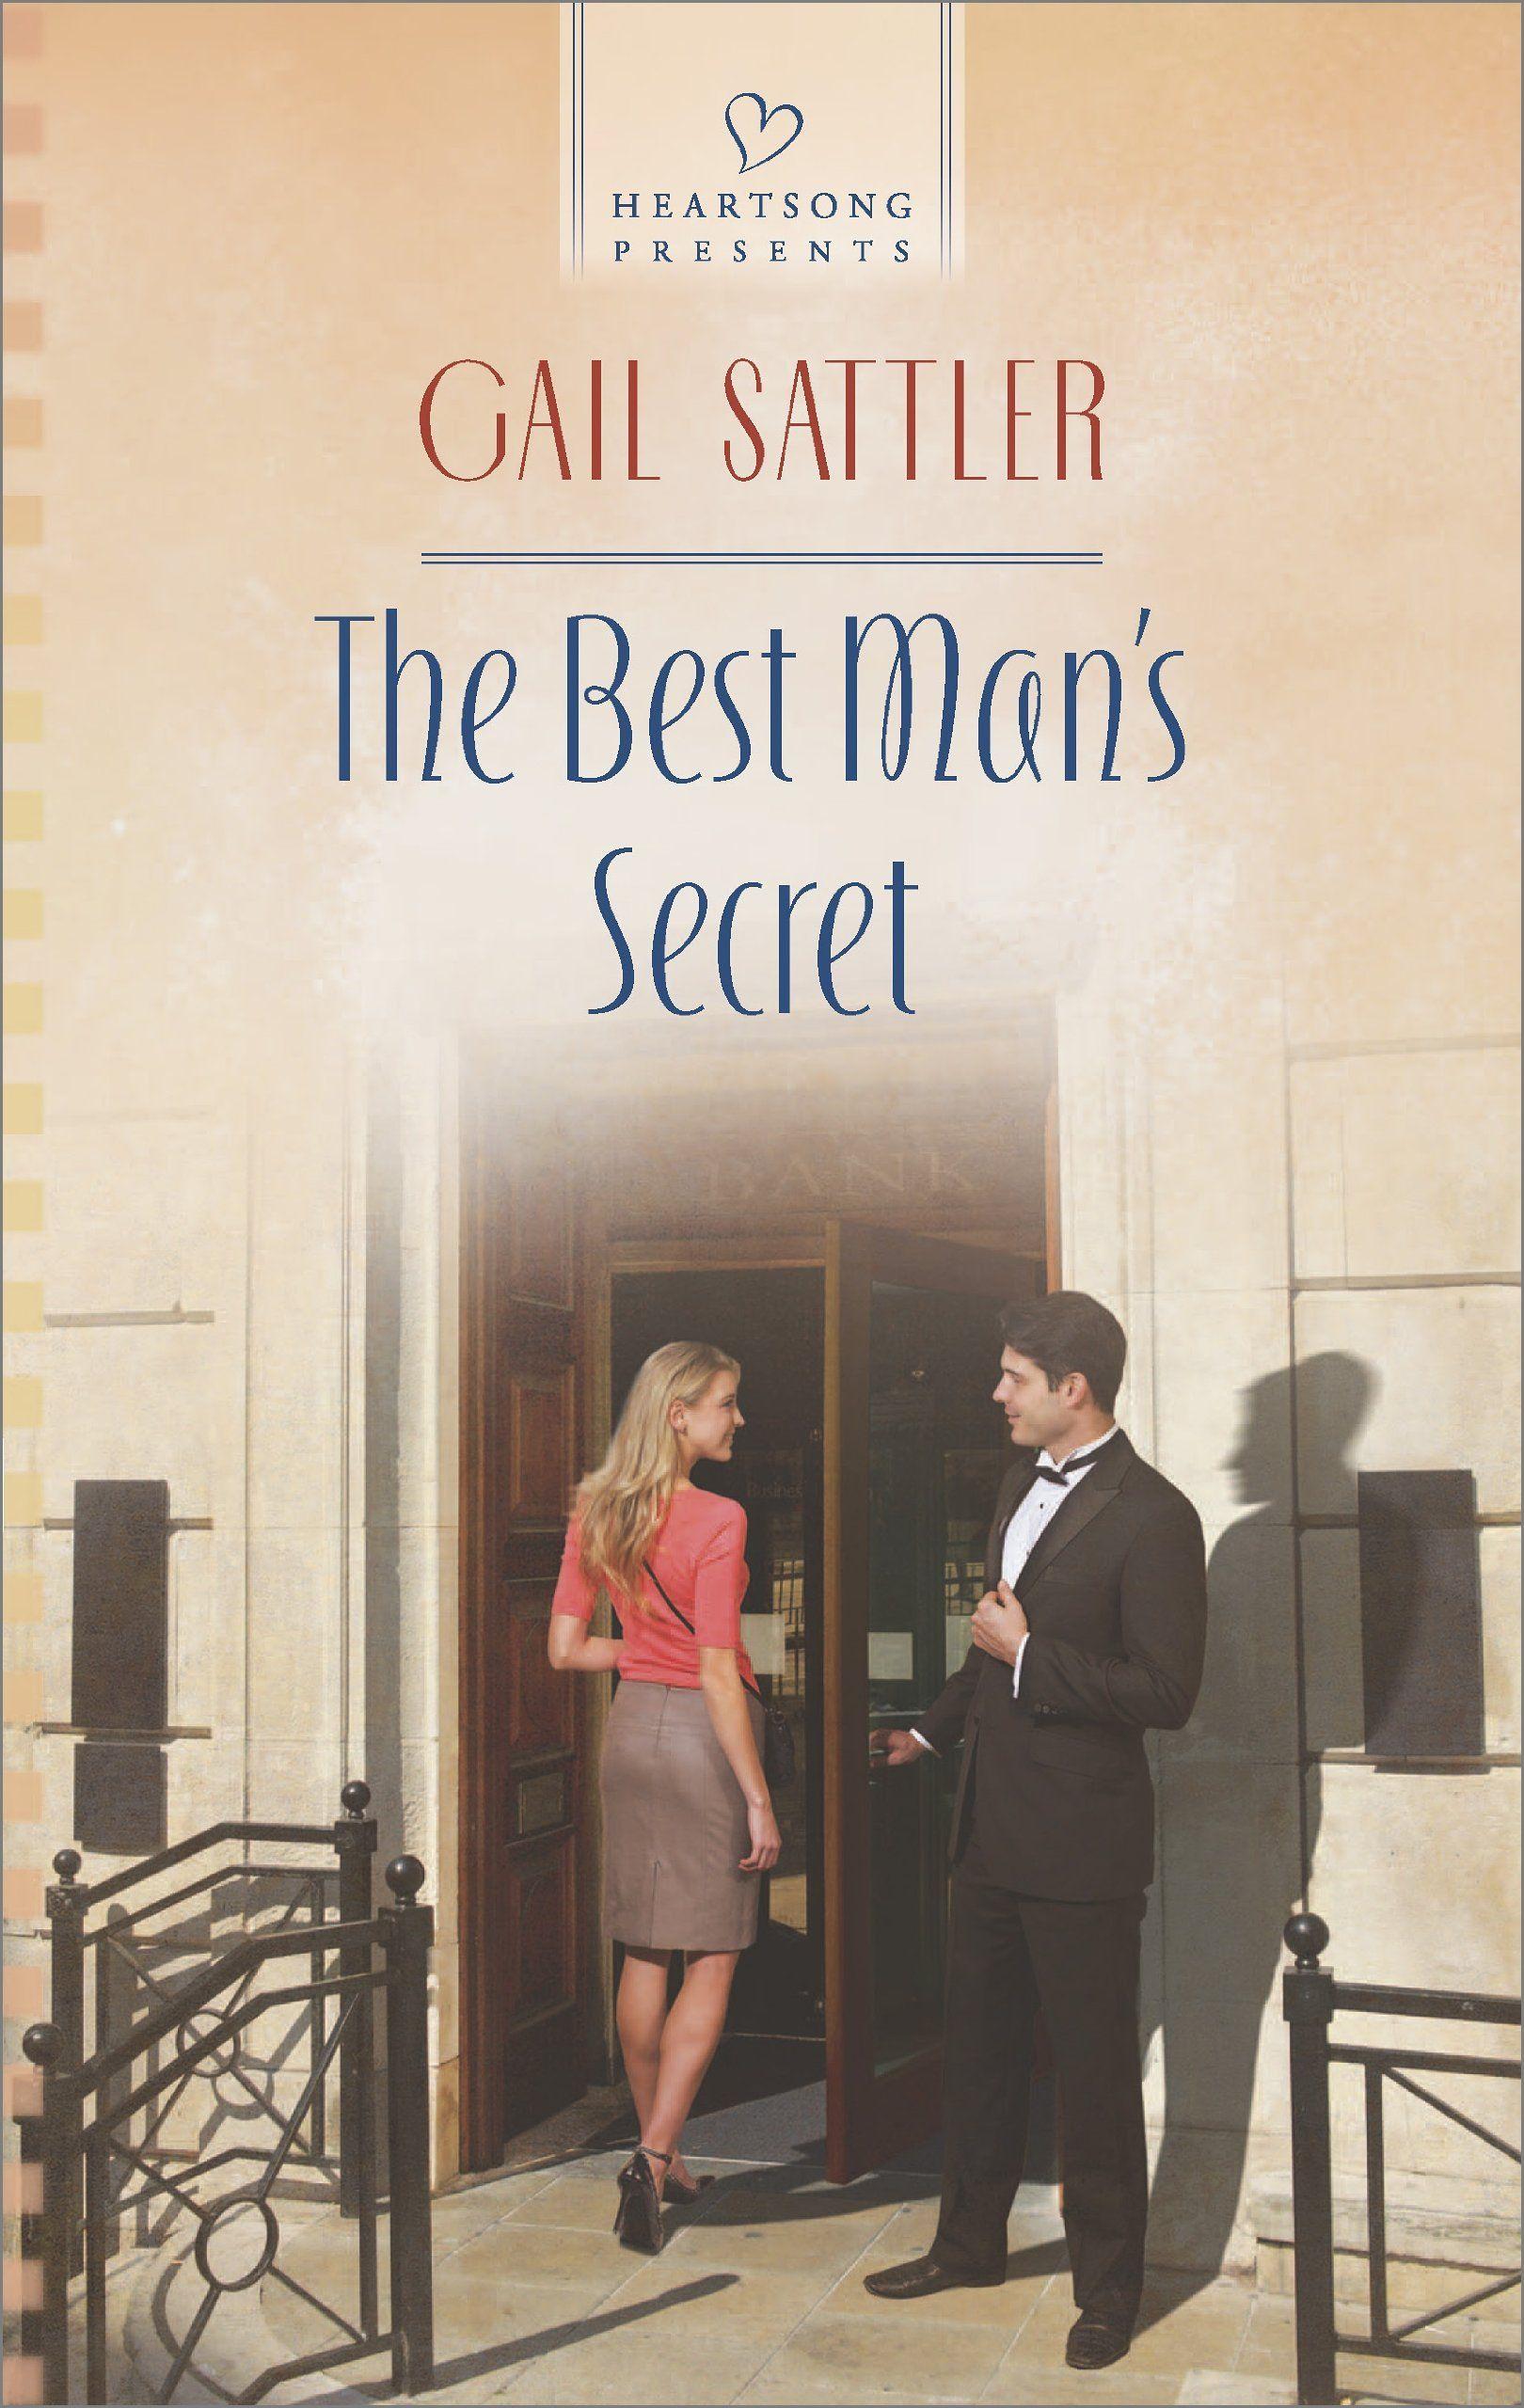 Gail Sattler - The Best Man's Secrets / https://www.goodreads.com/book/show/20523701-the-best-man-s-secret?from_search=true&search_version=service